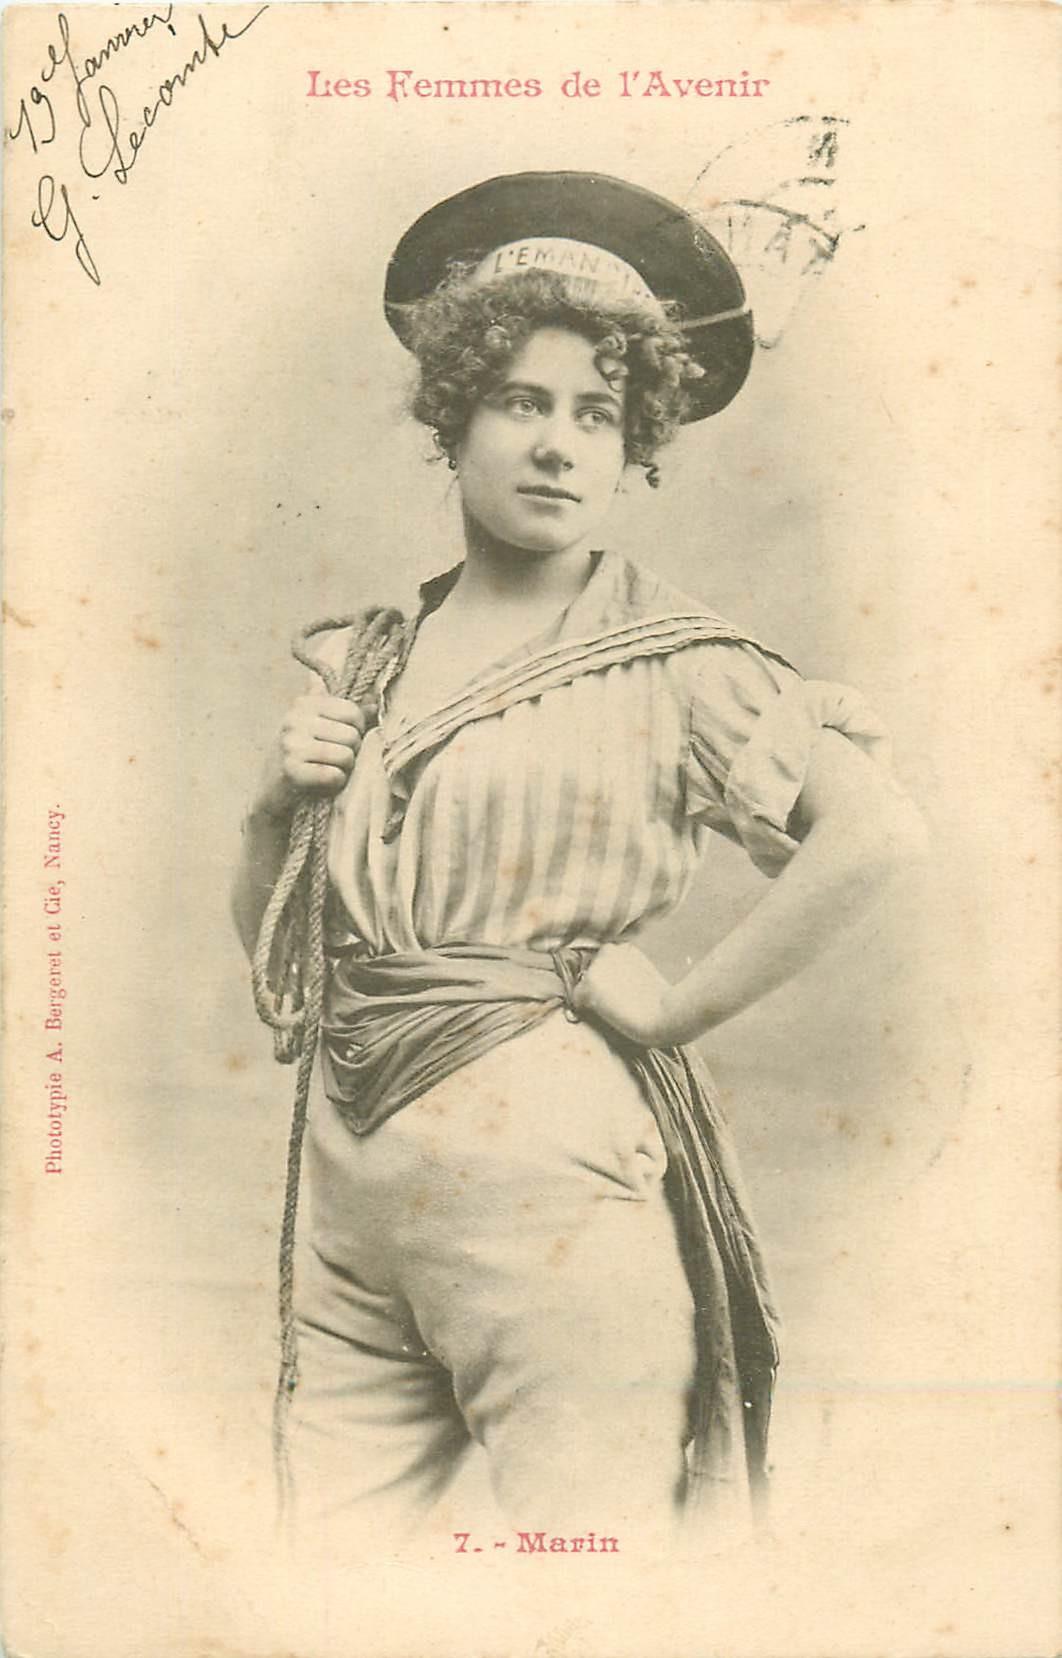 illustrateur BERGERET. Marin les Femmes de l'Avenir 1903